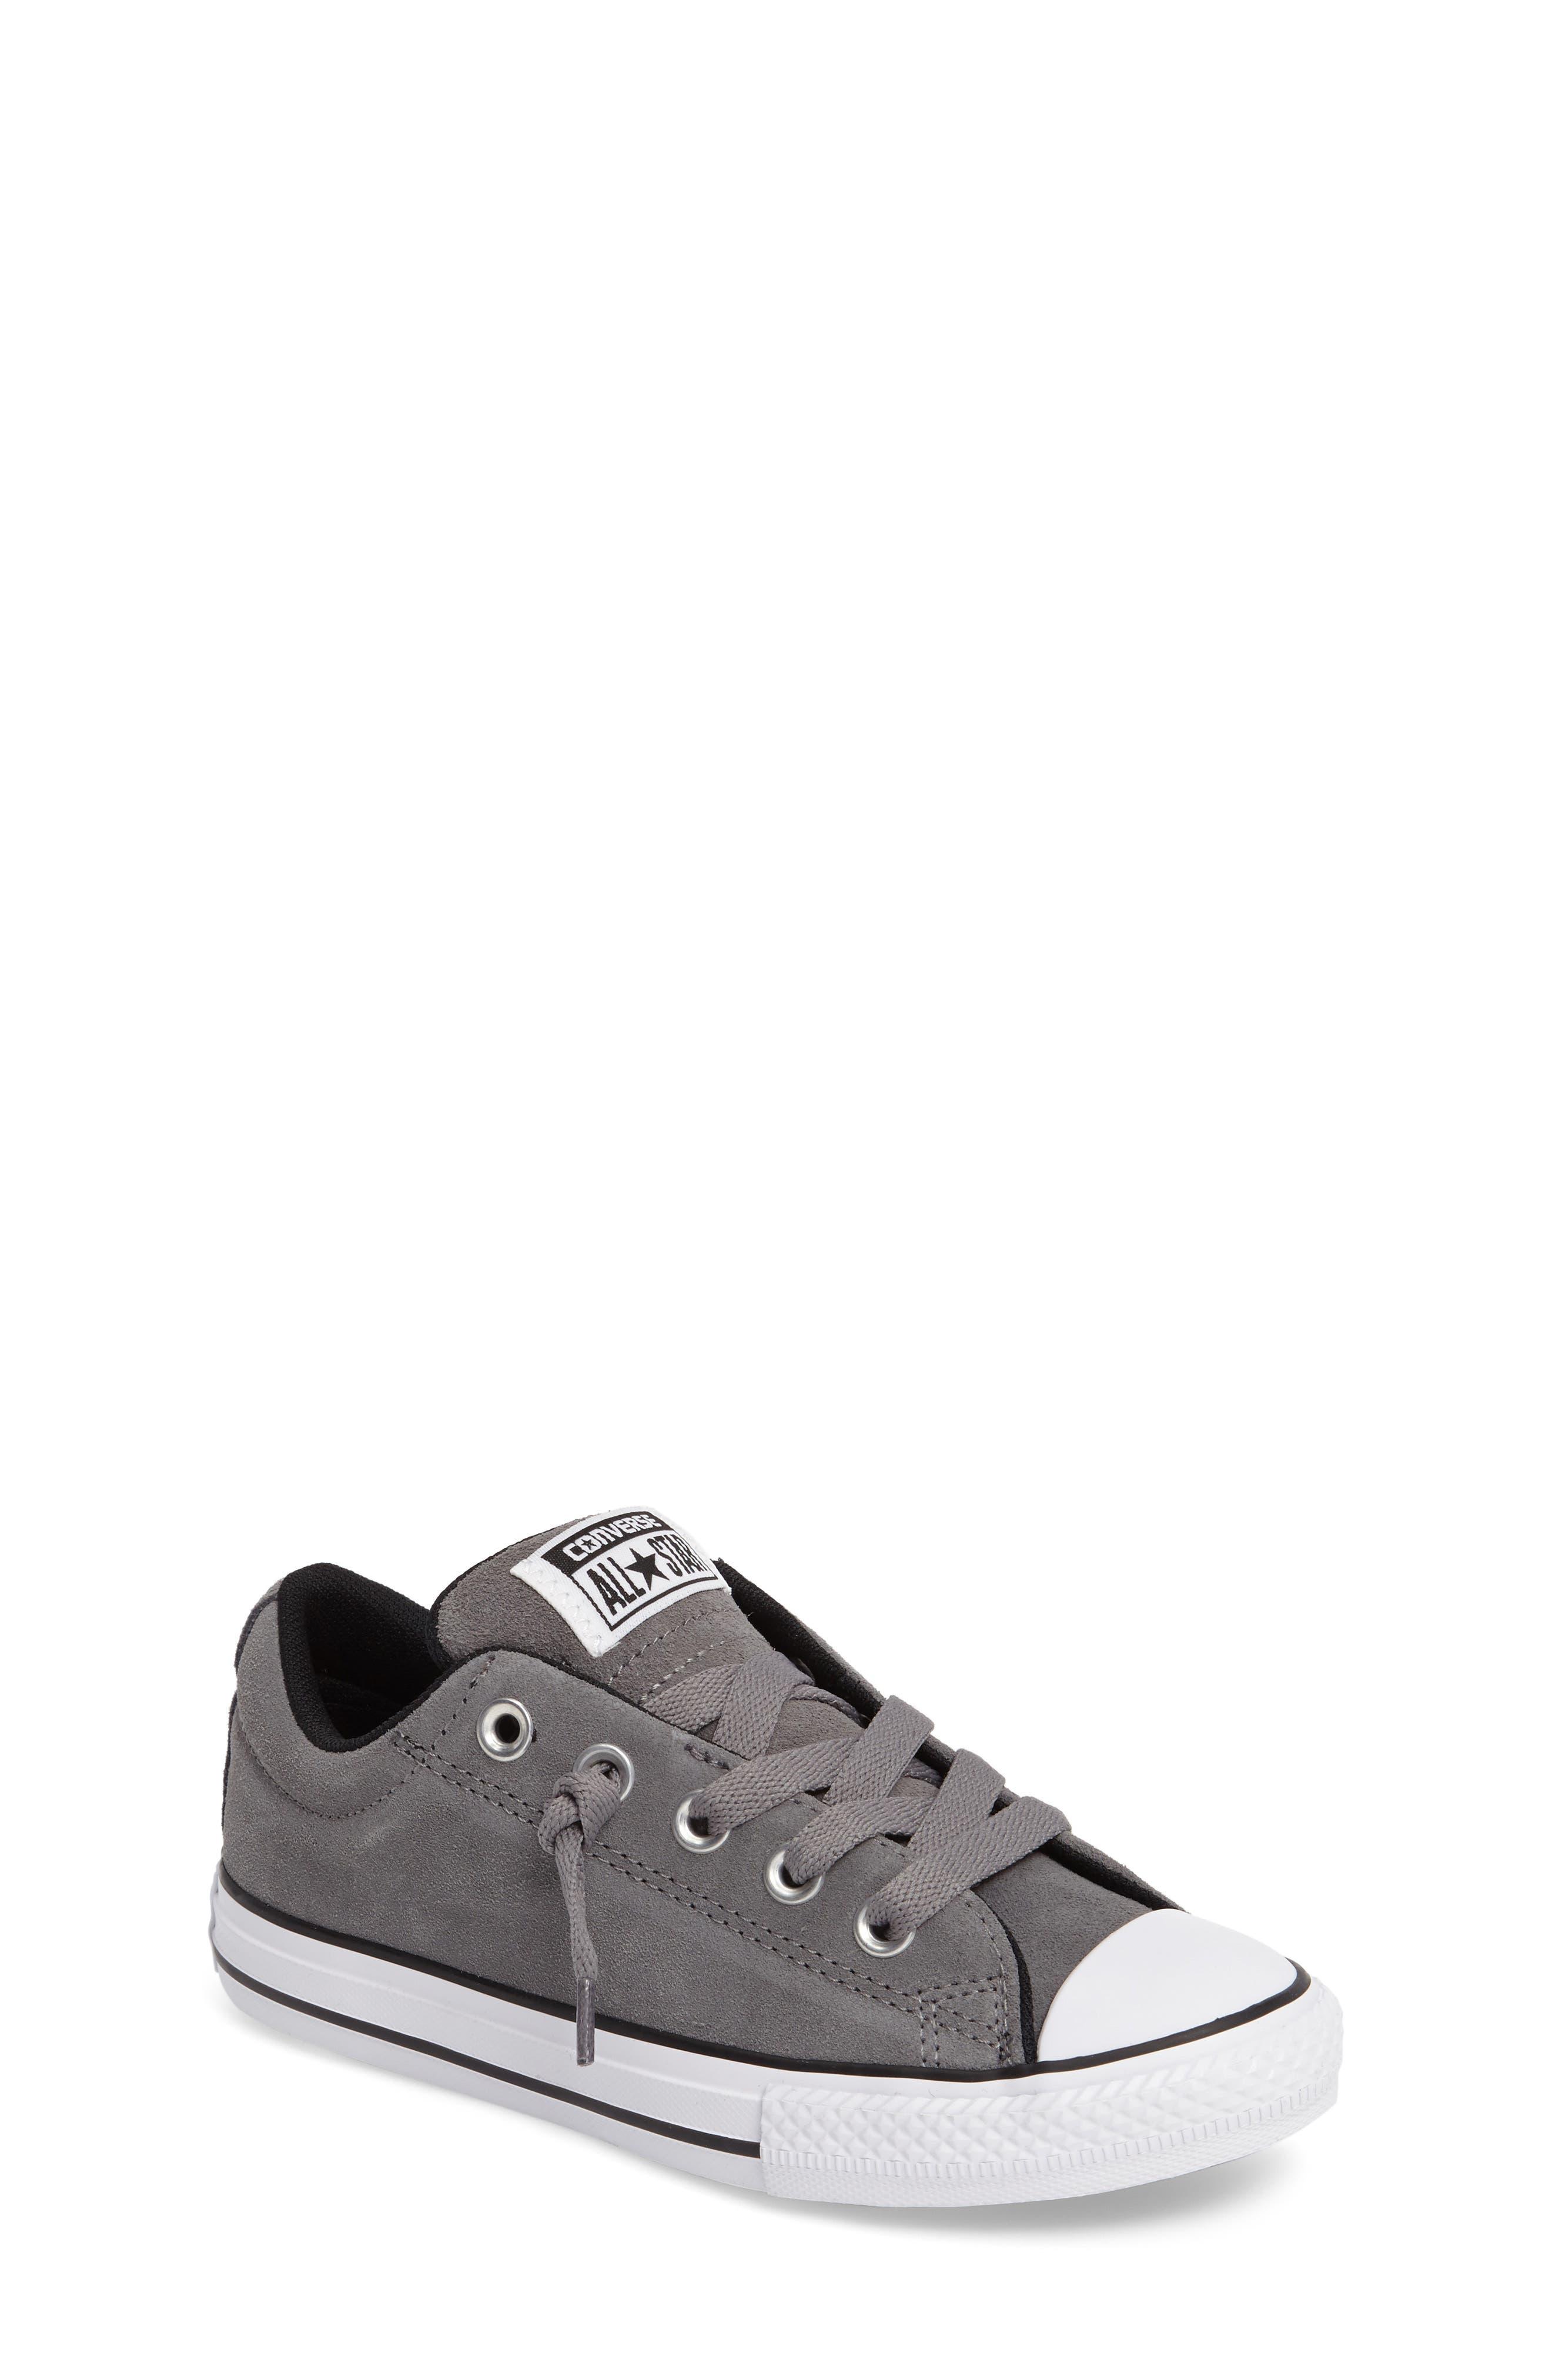 Chuck Taylor<sup>®</sup> All Star<sup>®</sup> Street Sneaker,                             Main thumbnail 1, color,                             Mason/ Black/ White